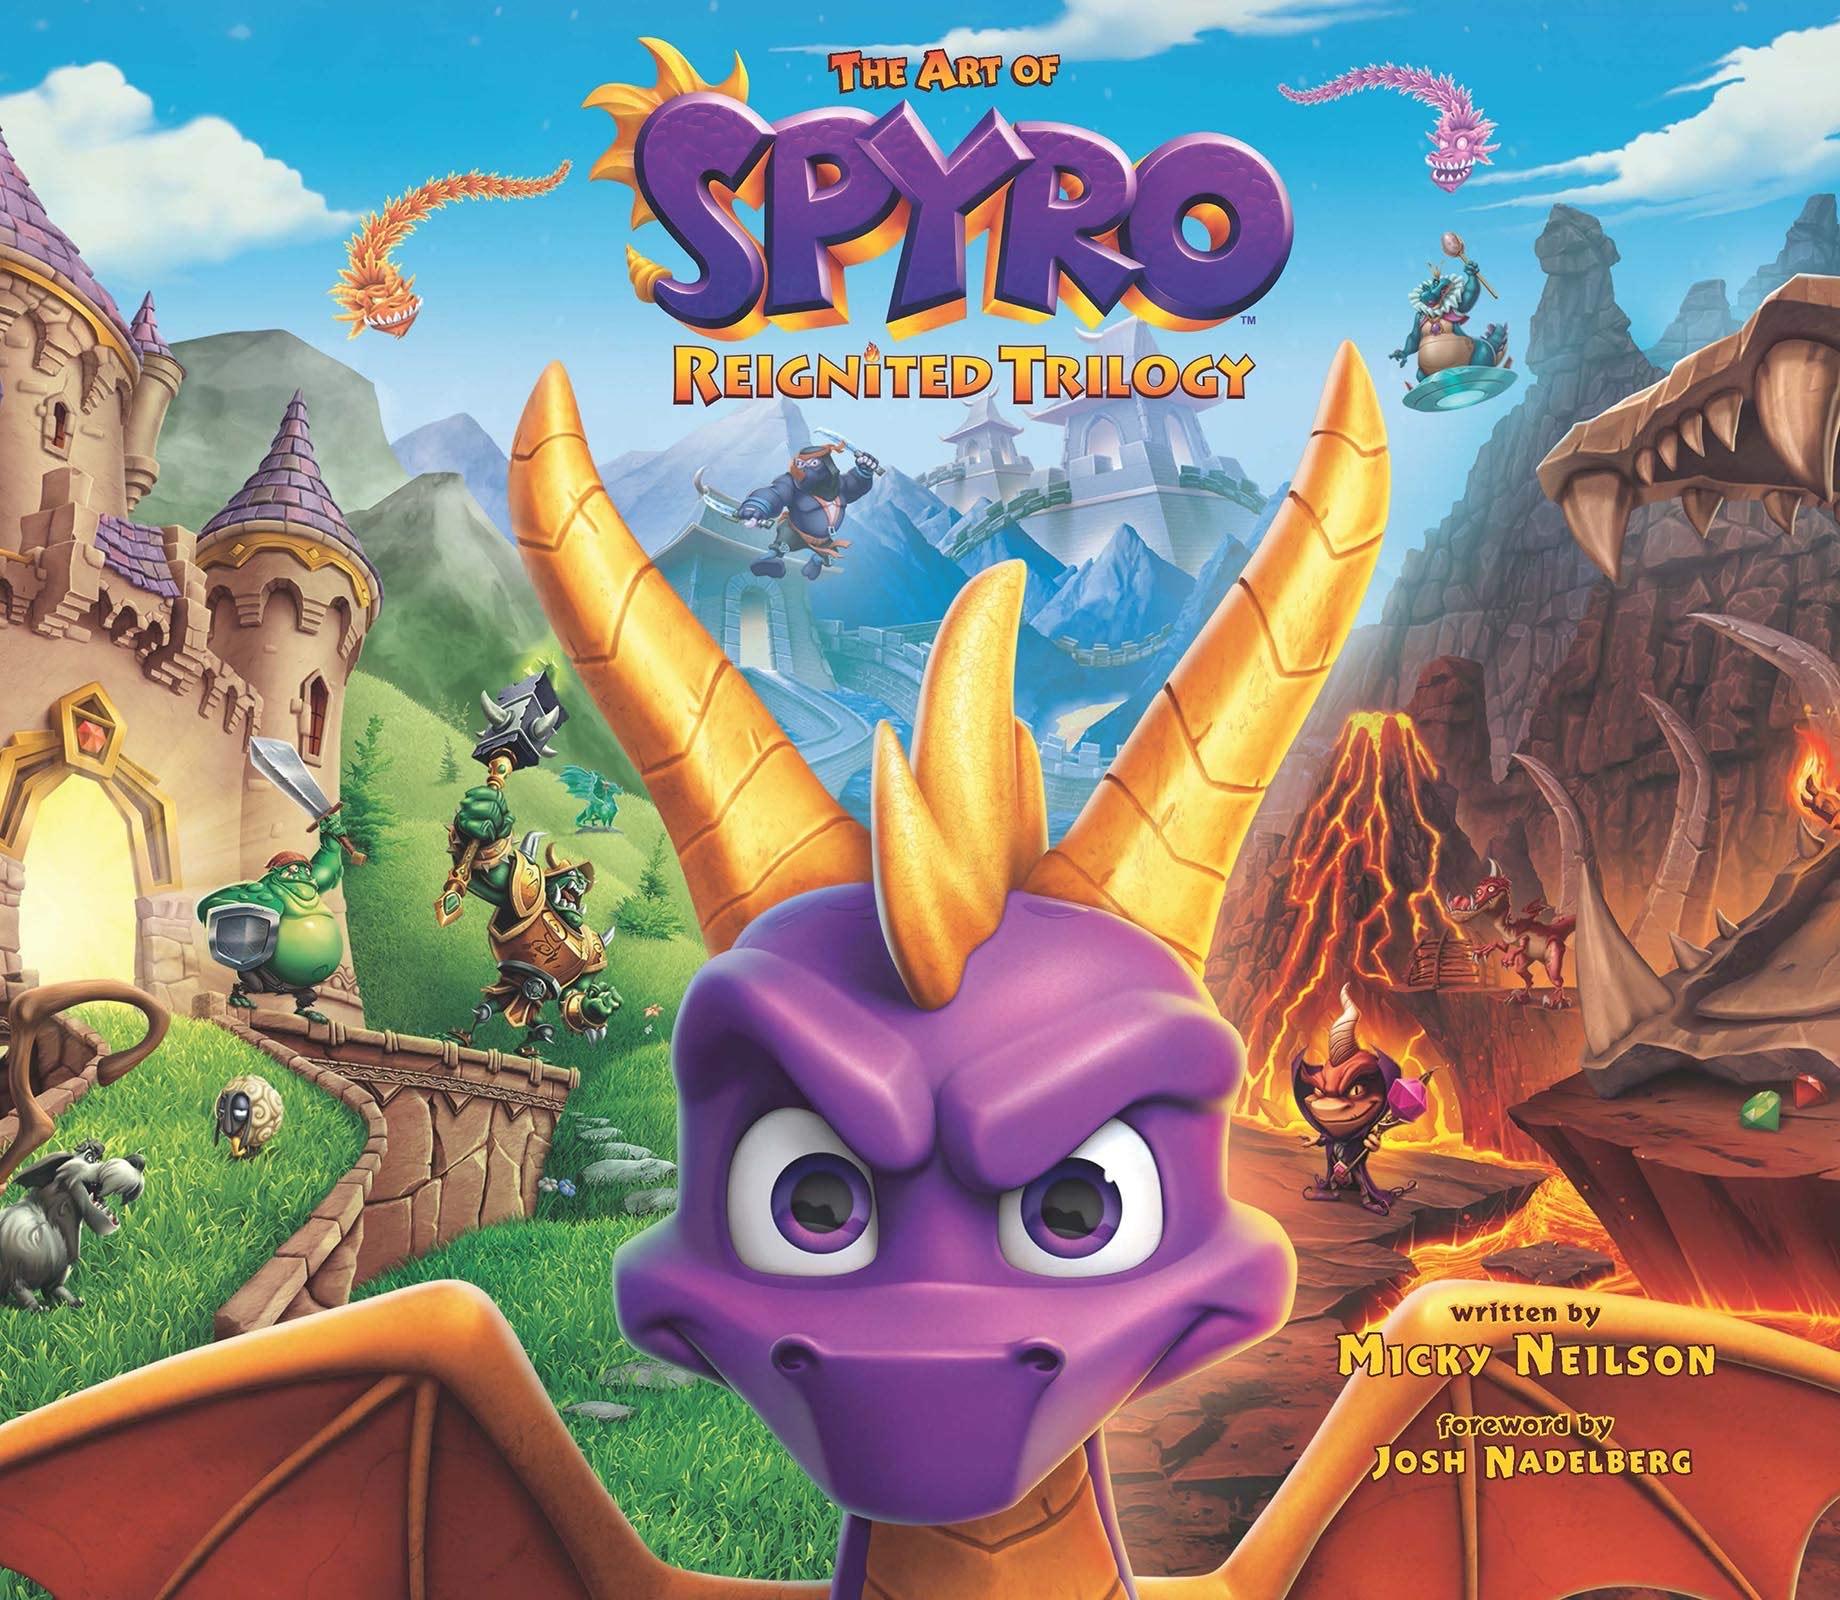 [Nintendo eShop] Spyro Reignited Trilogy | Nintendo Switch Download|